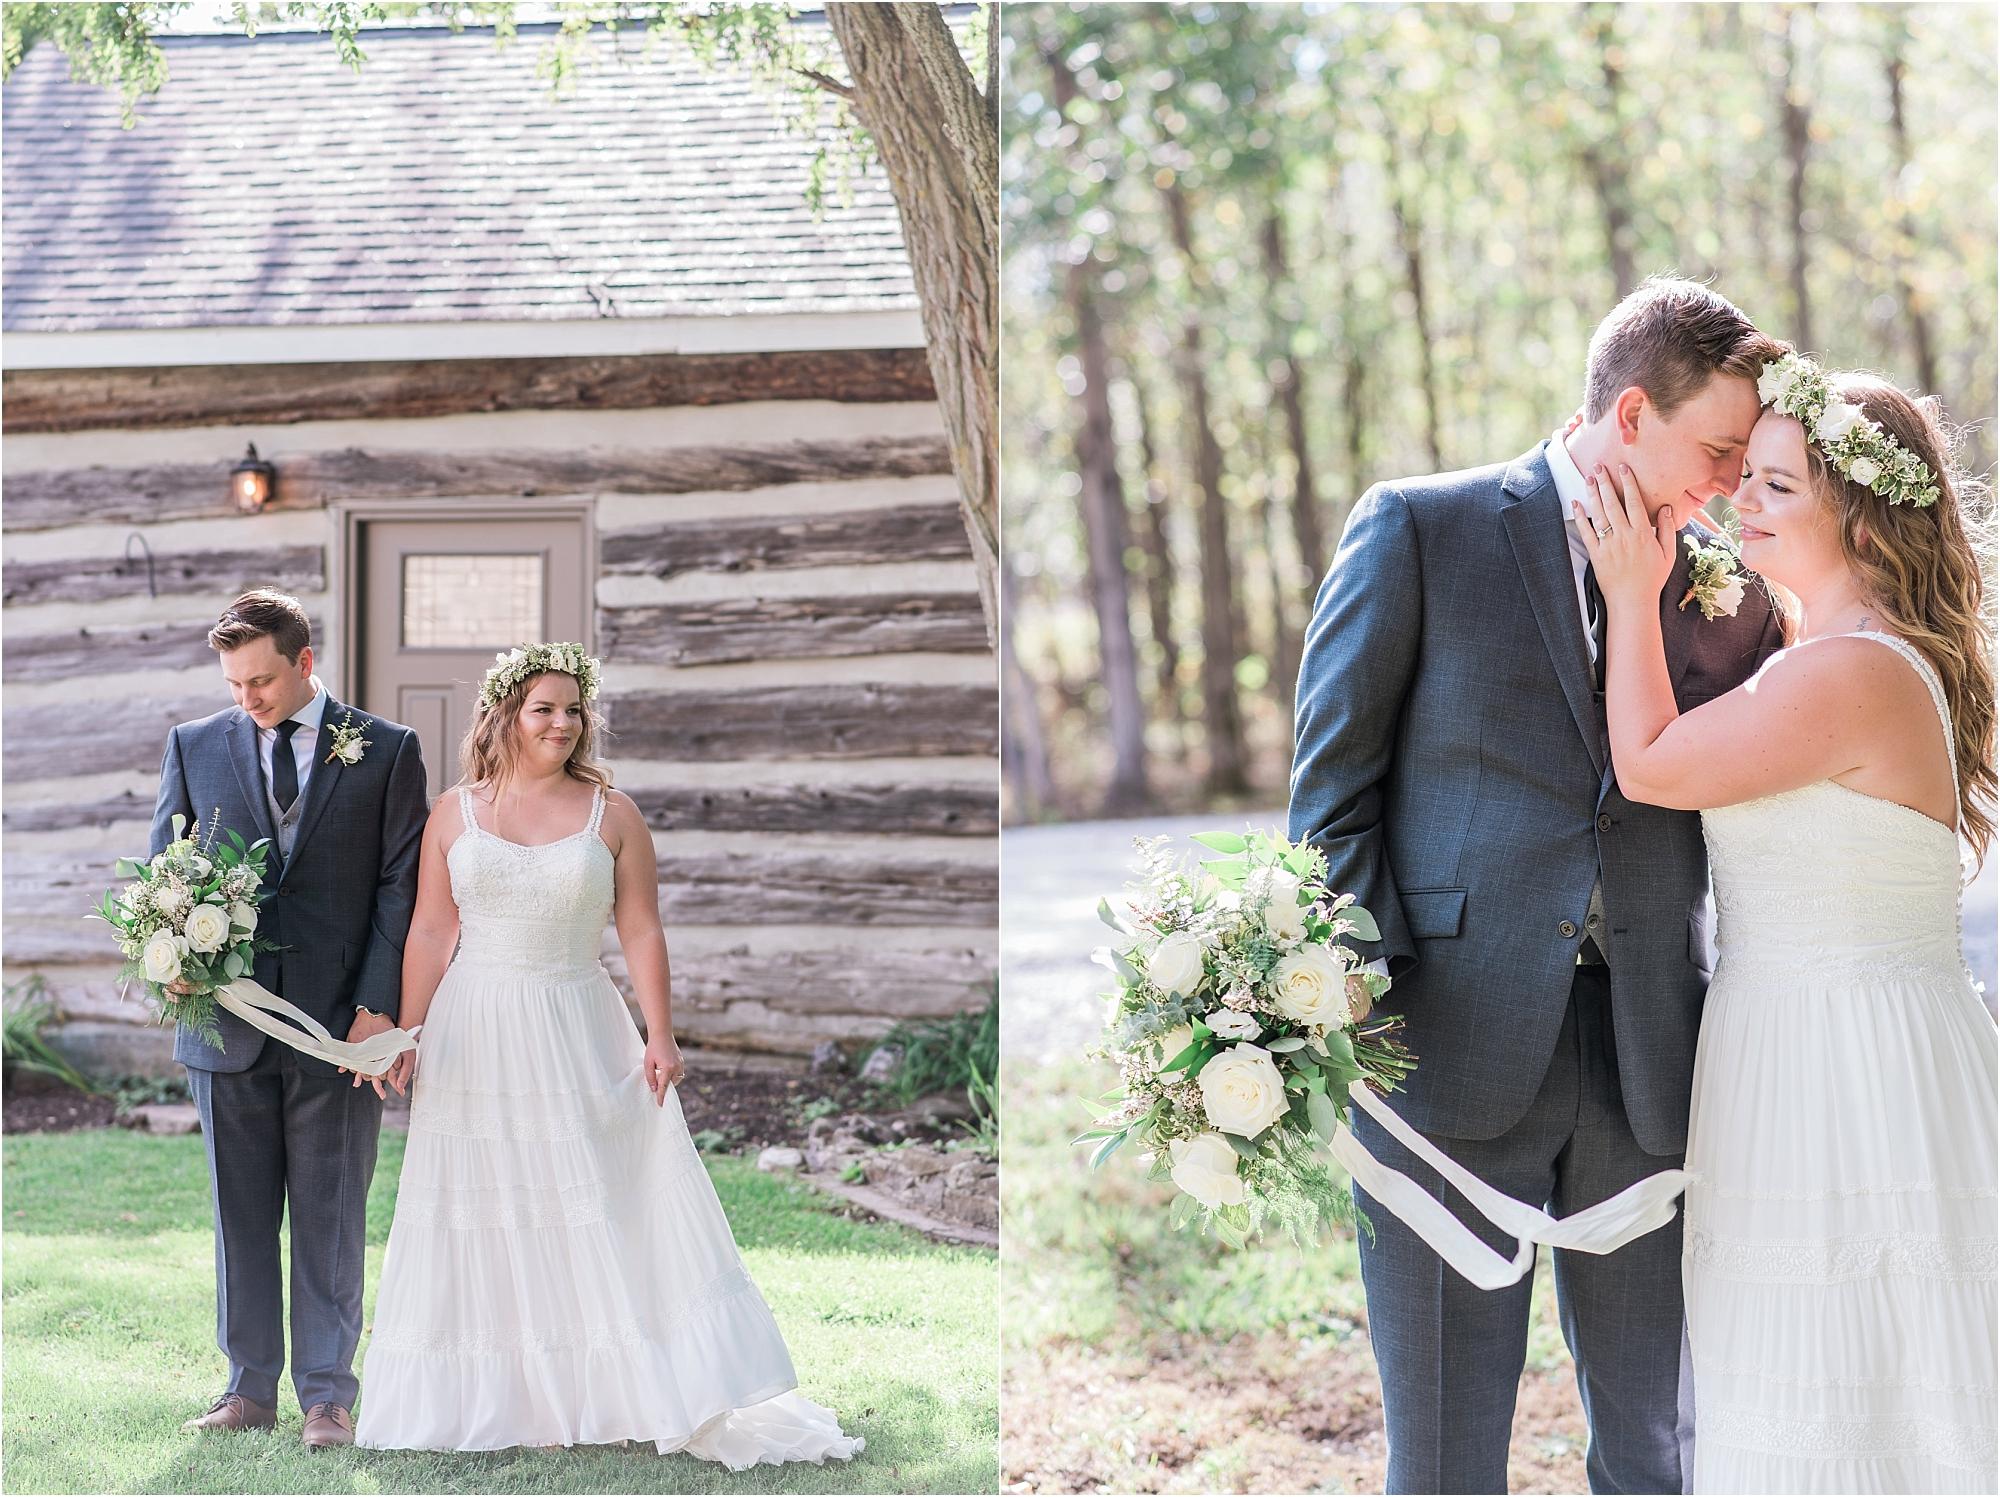 0036 Summer Stonefields Wedding Carleton Place - Ottawa Wedding - Photography by Emma_WEB.jpg